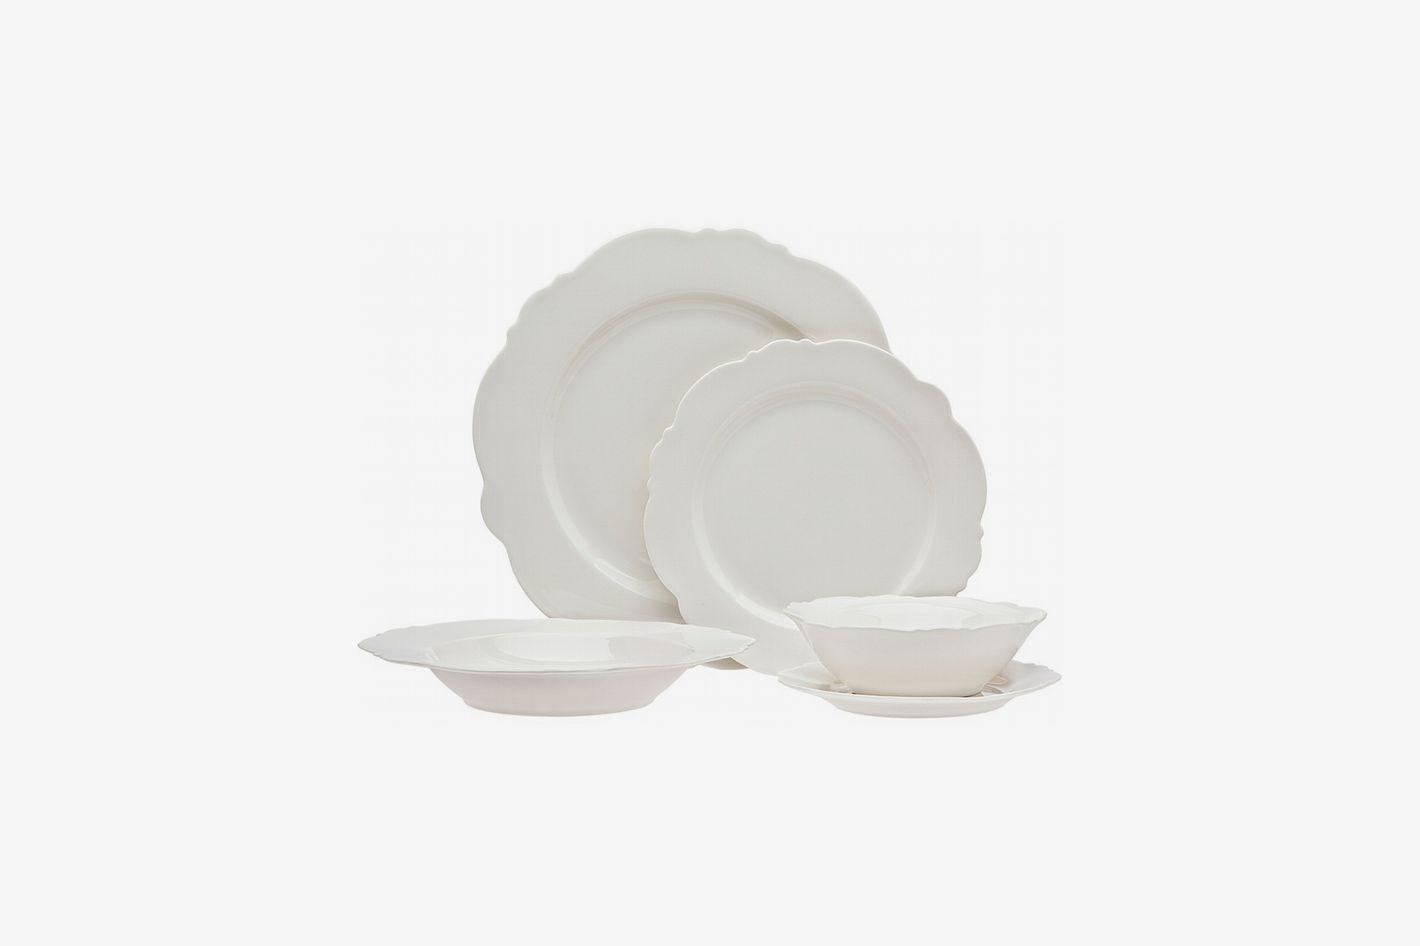 Godinger Bristol White Bone China 20-Piece Dinnerware Set